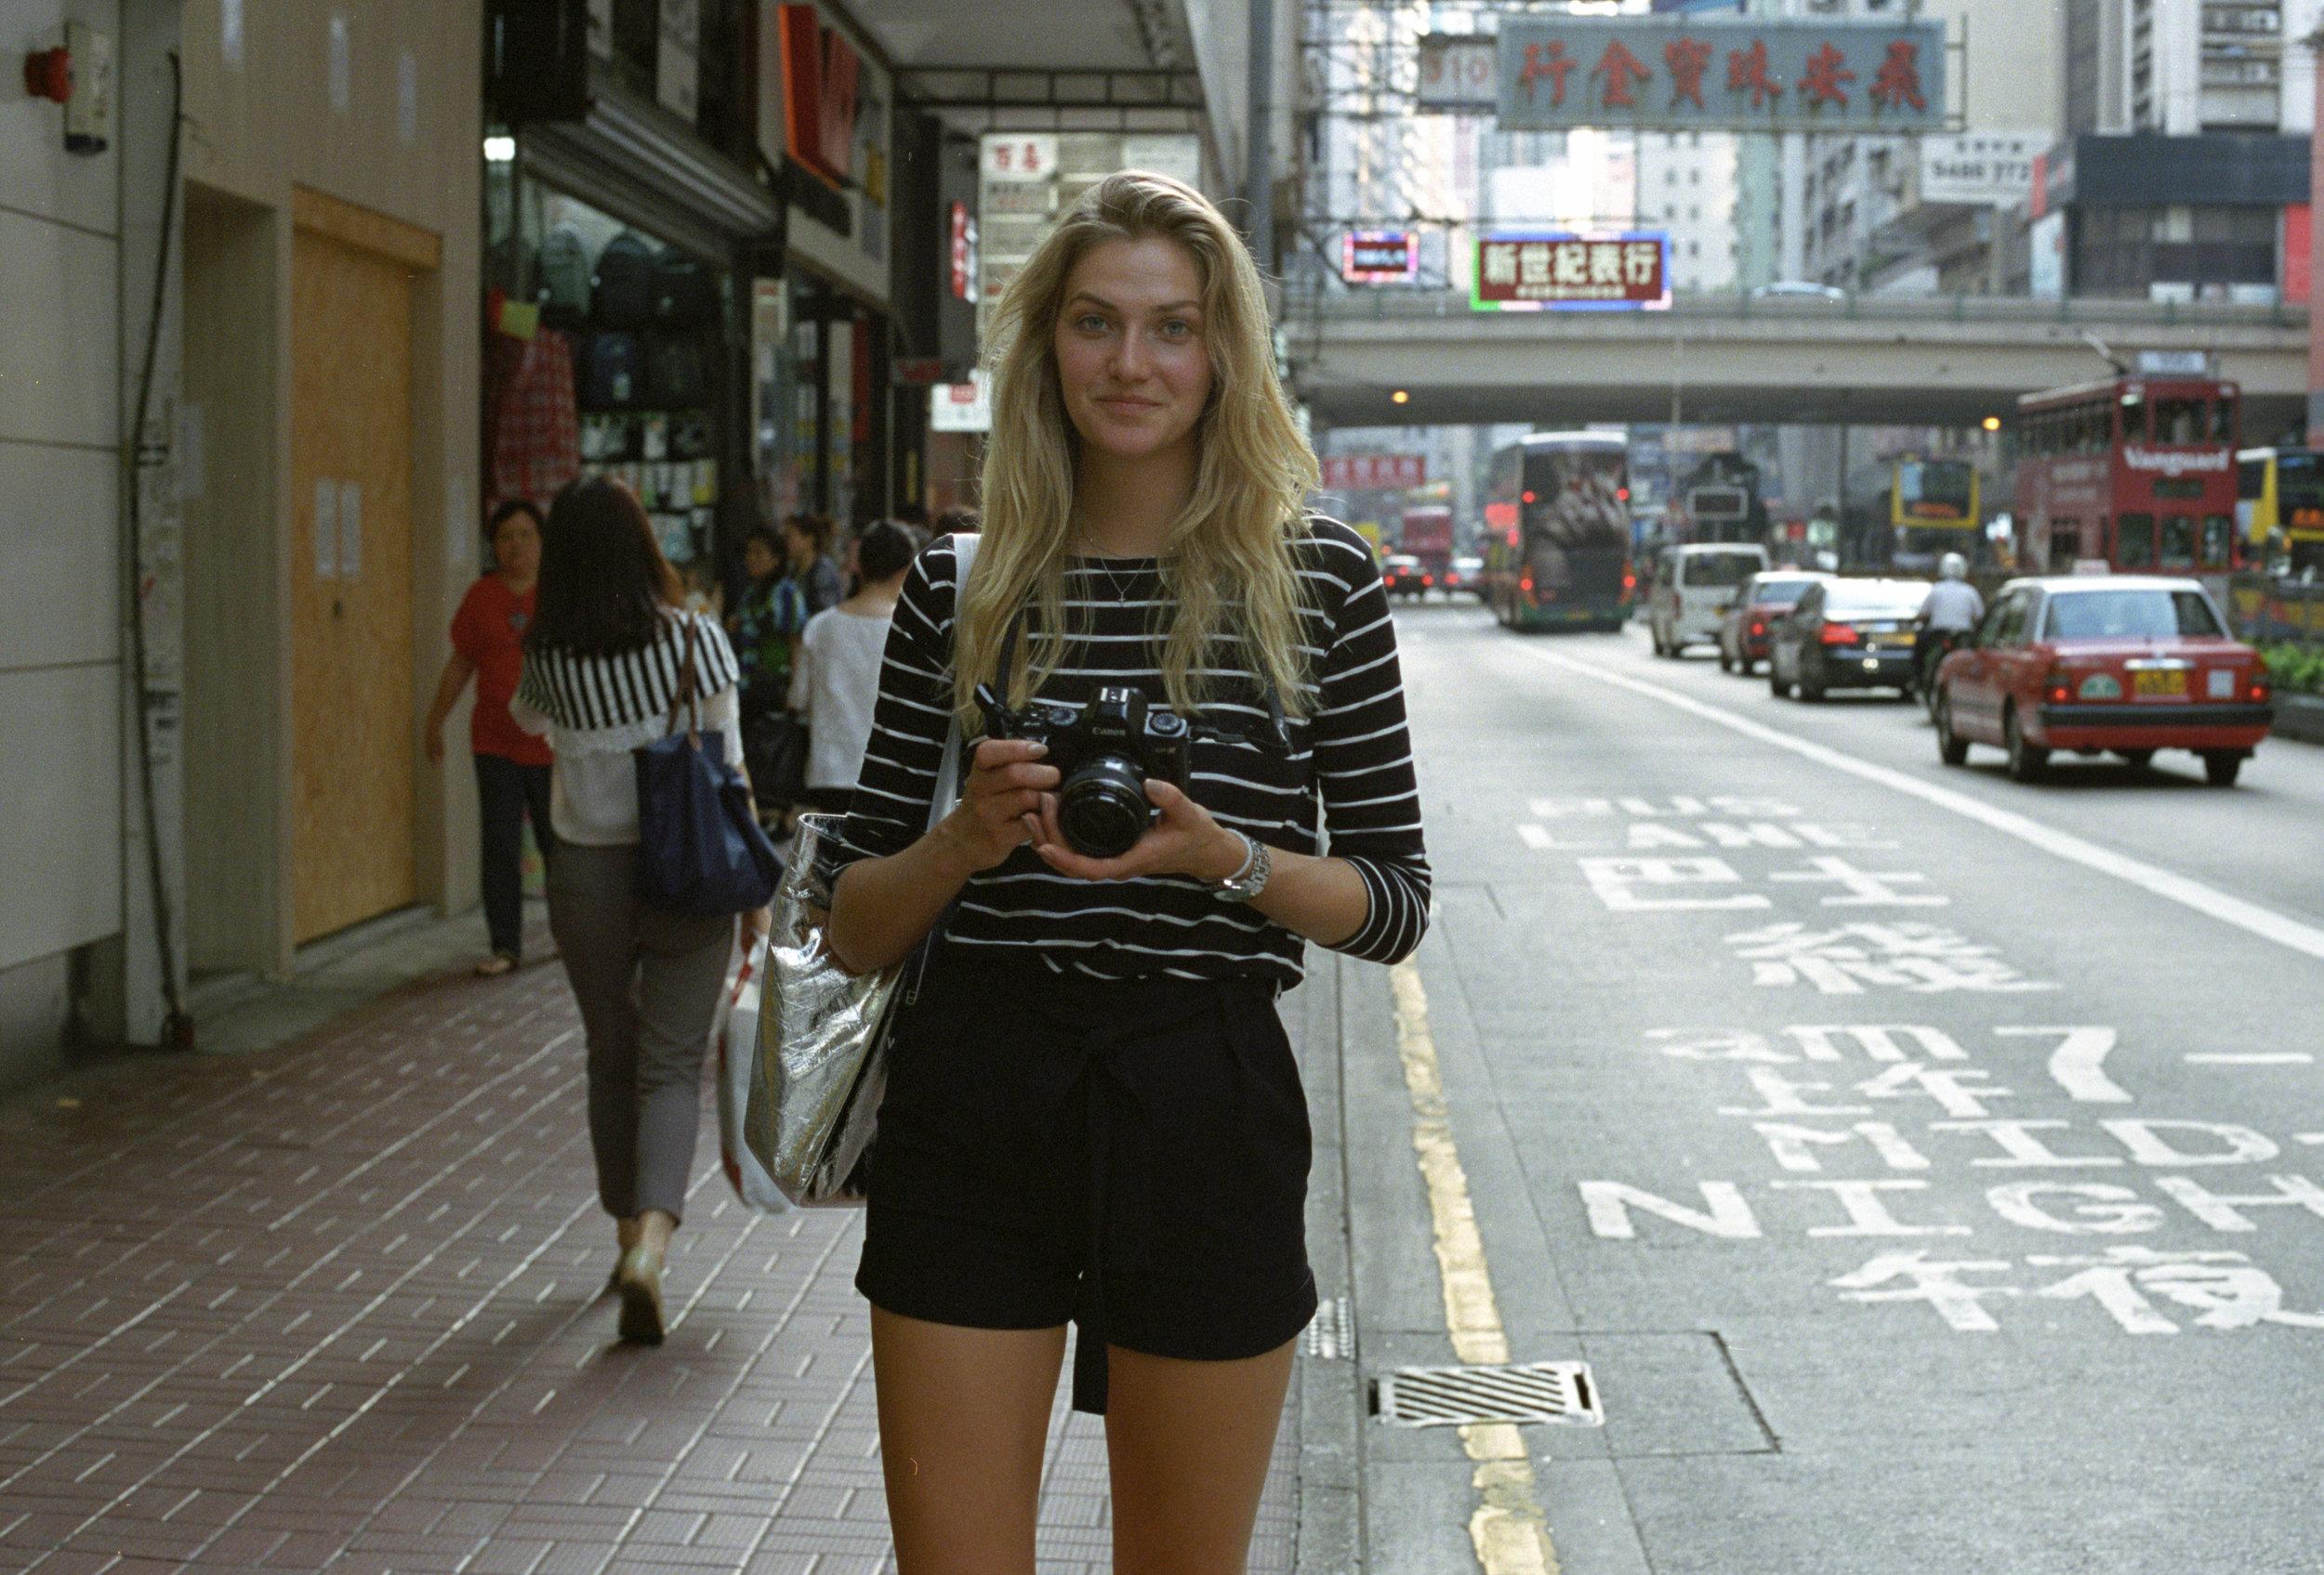 Nikon Coolscan 9000 + Nikon Scan 4.0